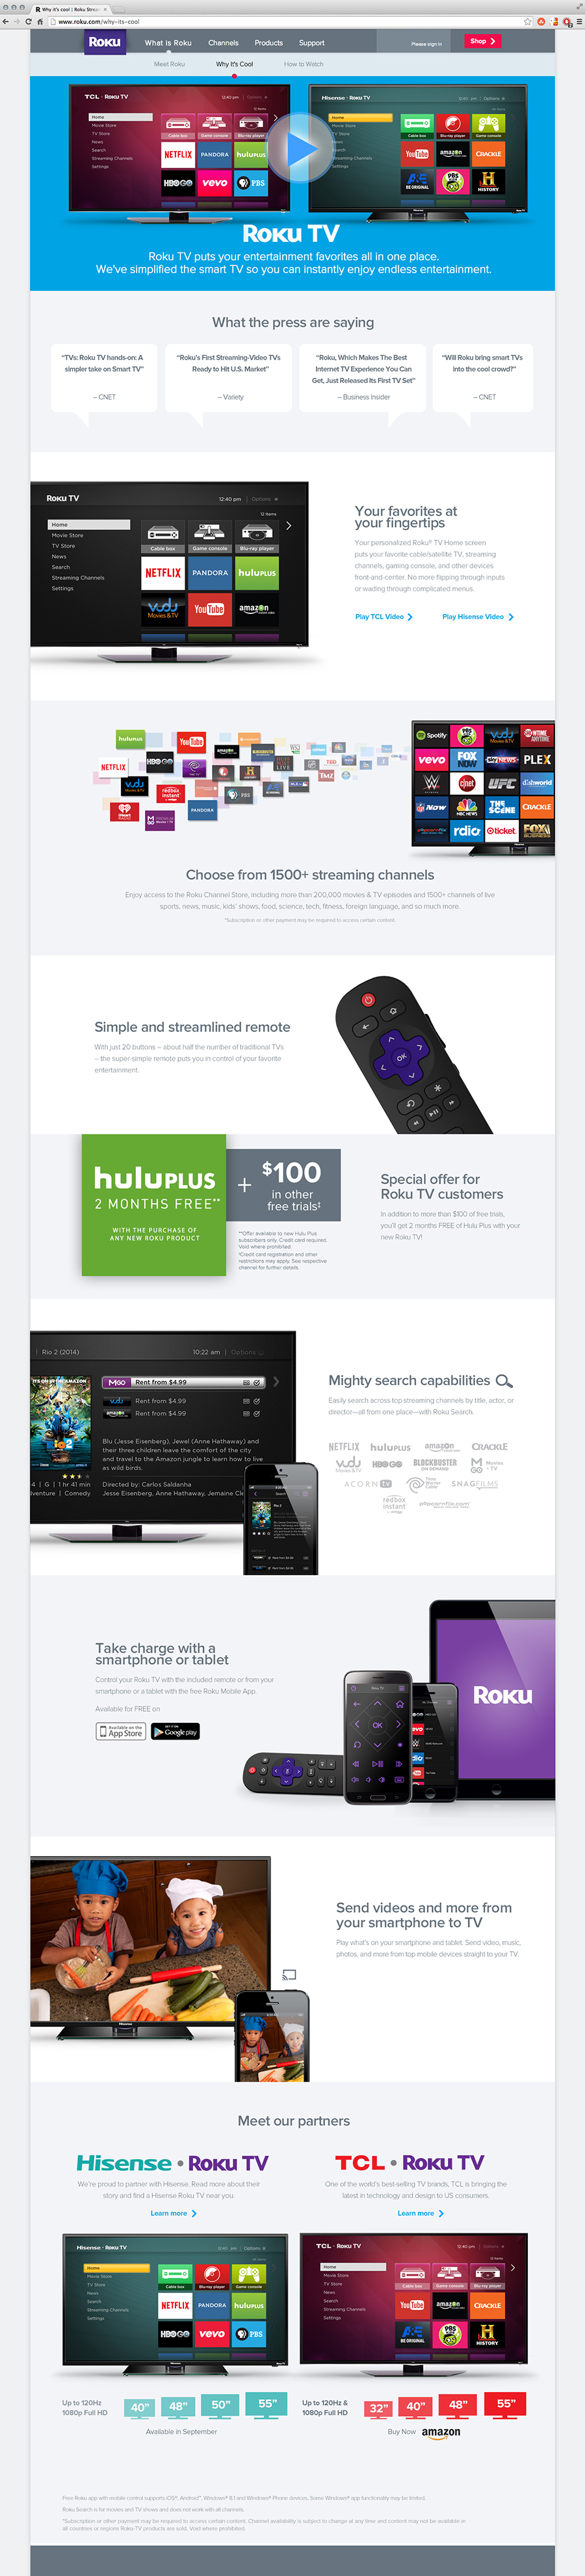 Roku-TV-Launch-Site